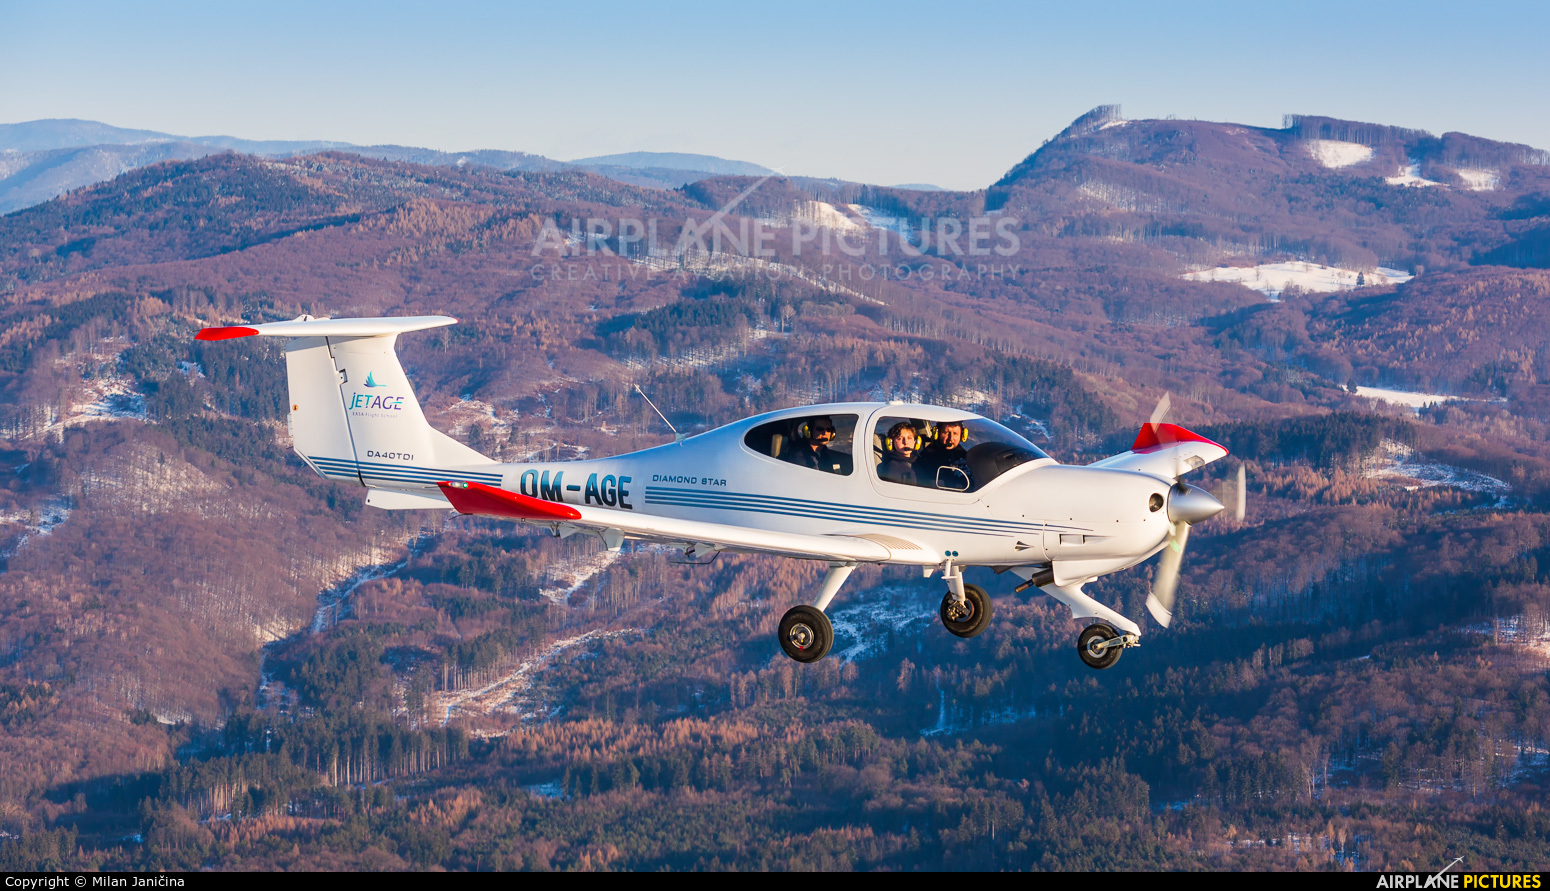 JetAge OM-AGE aircraft at In Flight - Slovakia